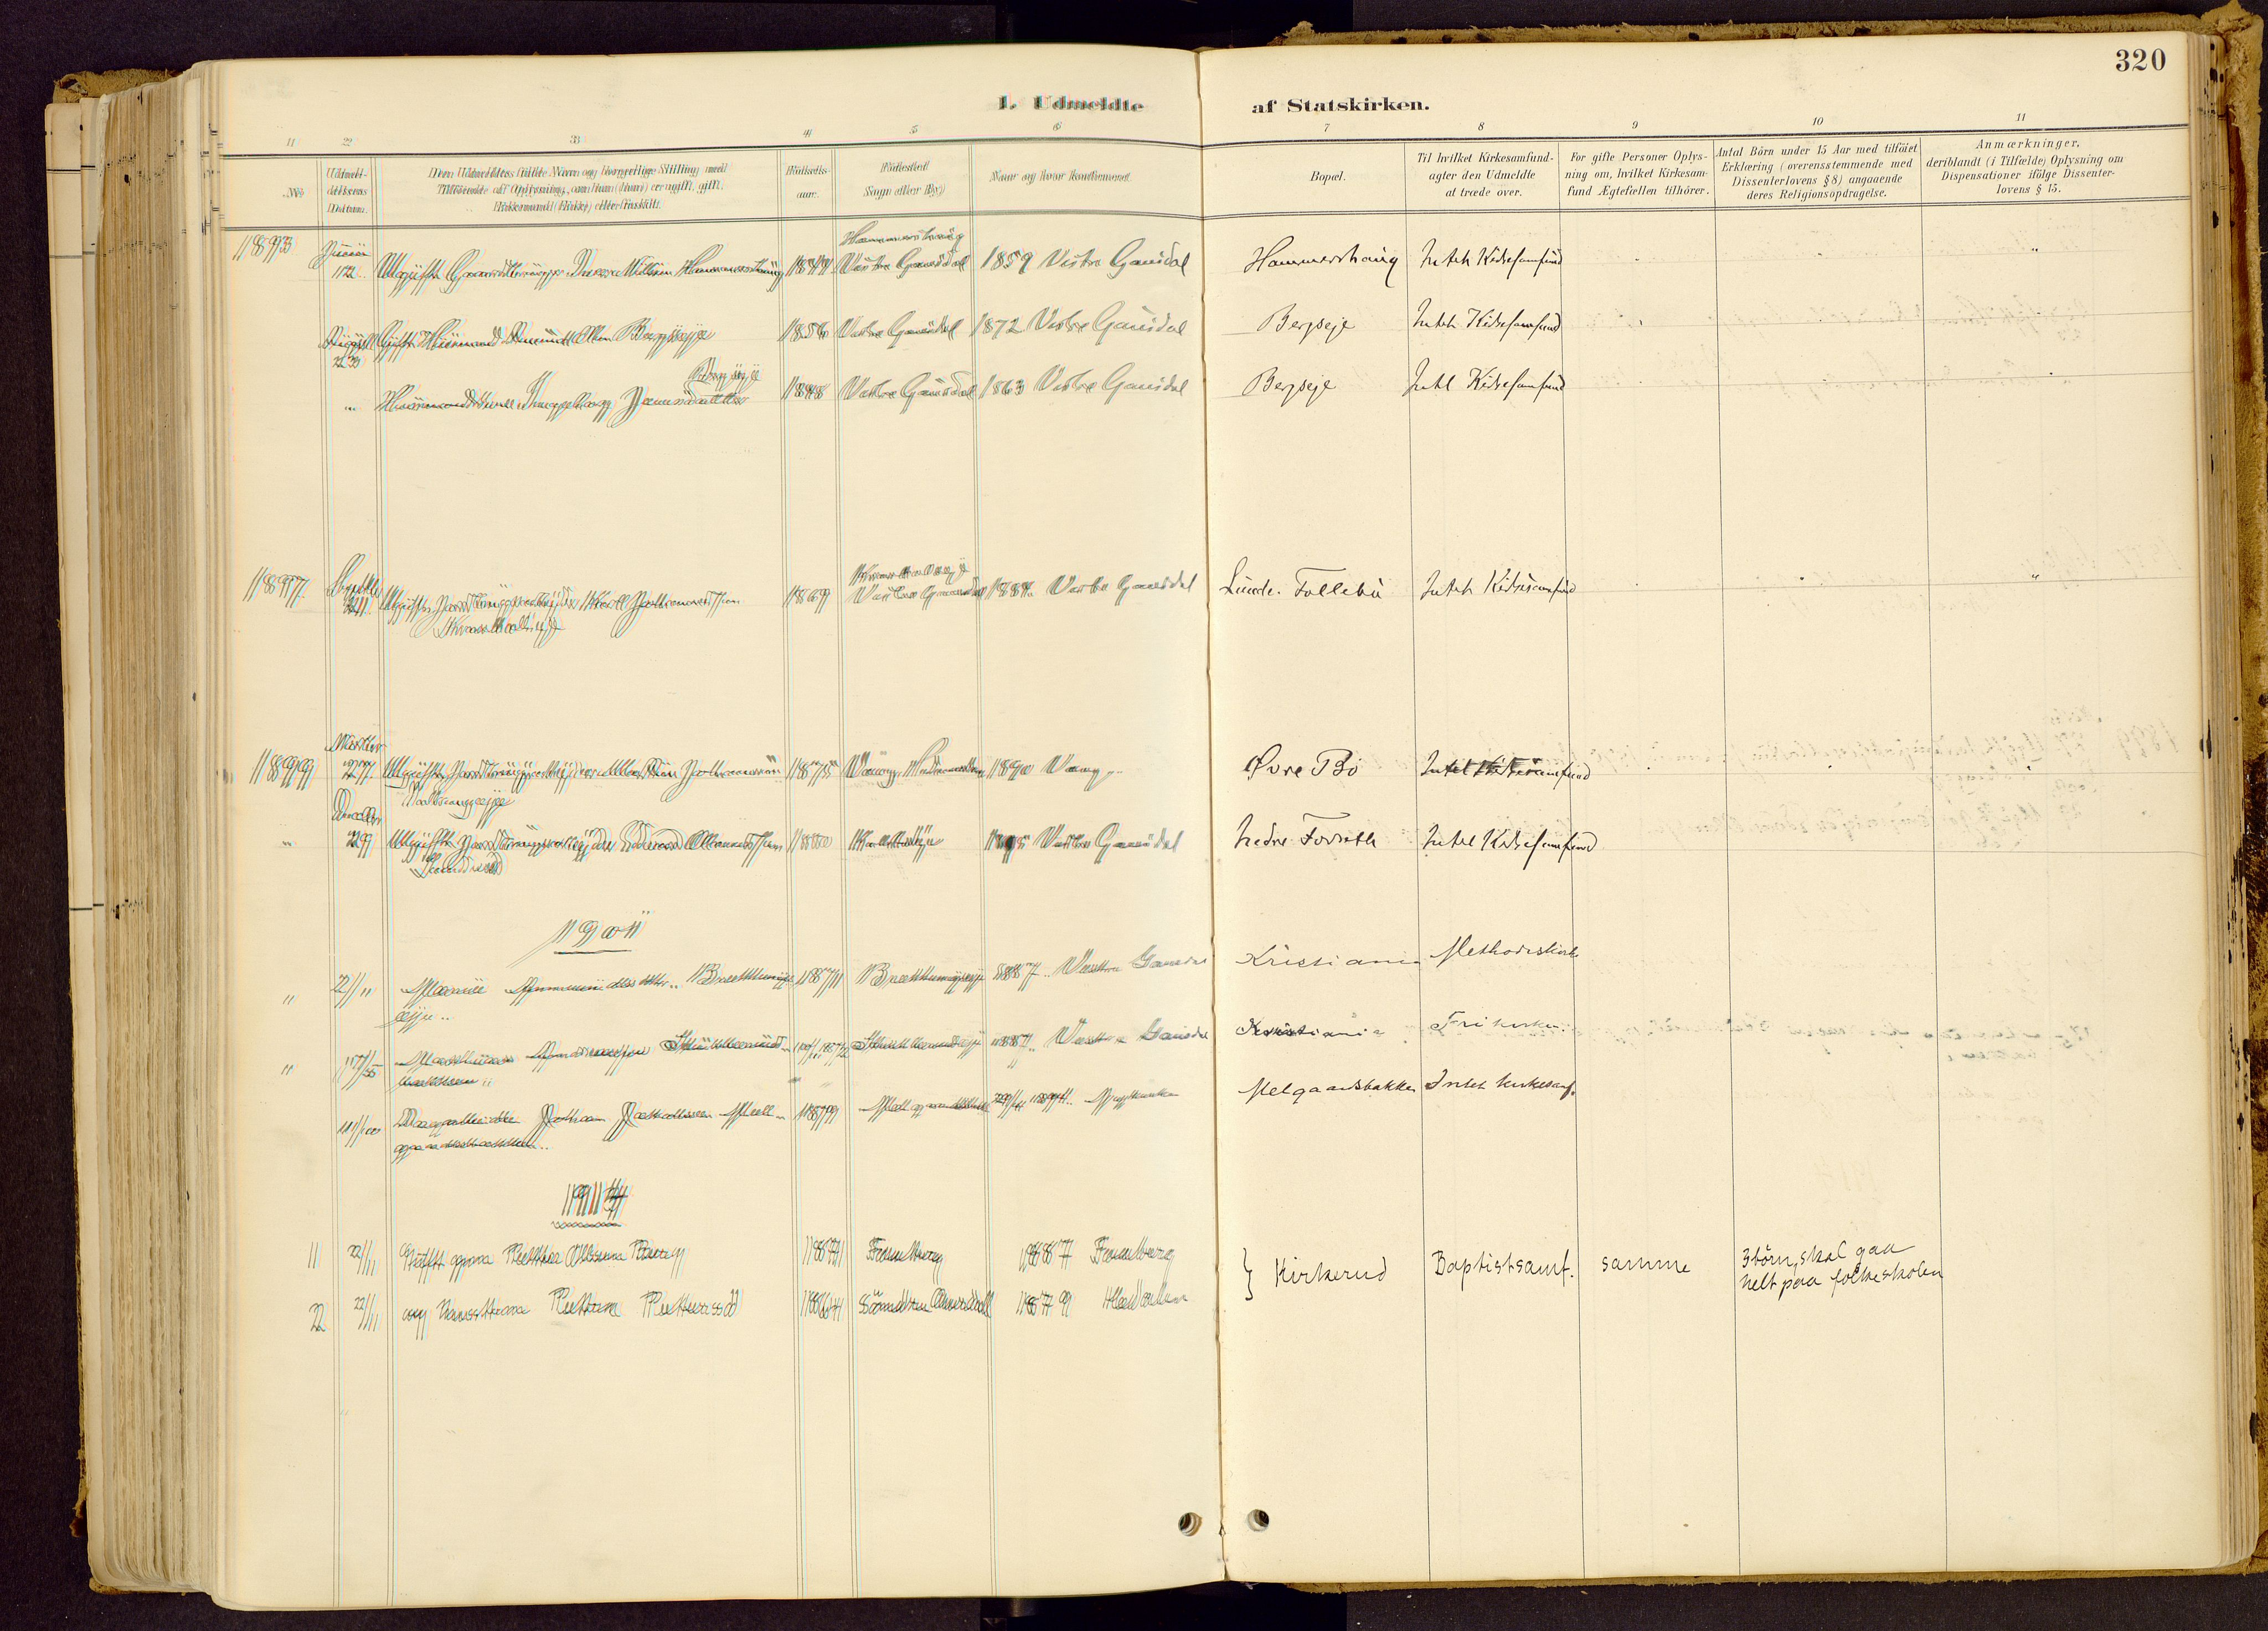 SAH, Vestre Gausdal prestekontor, Ministerialbok nr. 1, 1887-1914, s. 320